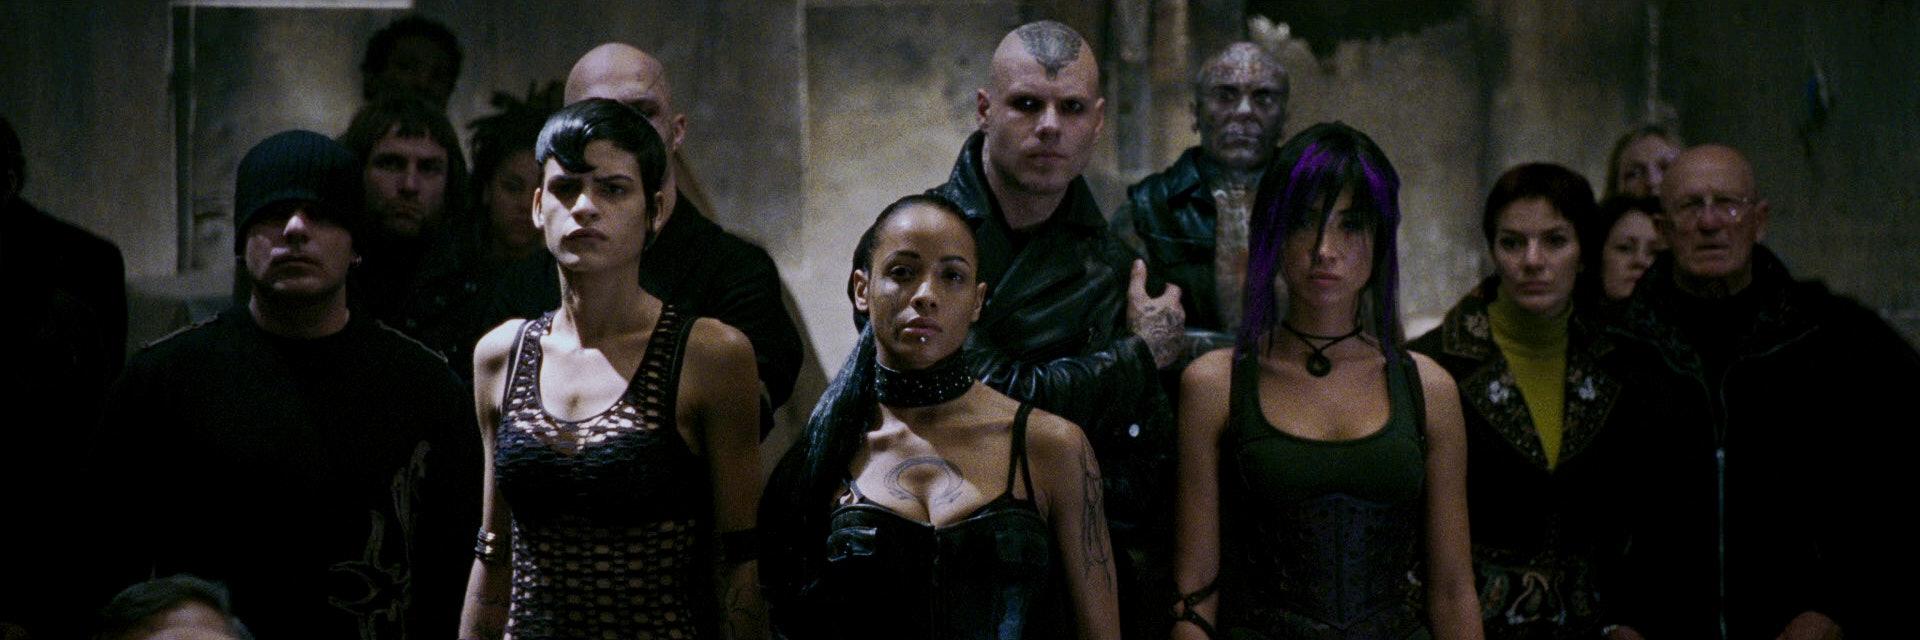 Morlocks X-Men